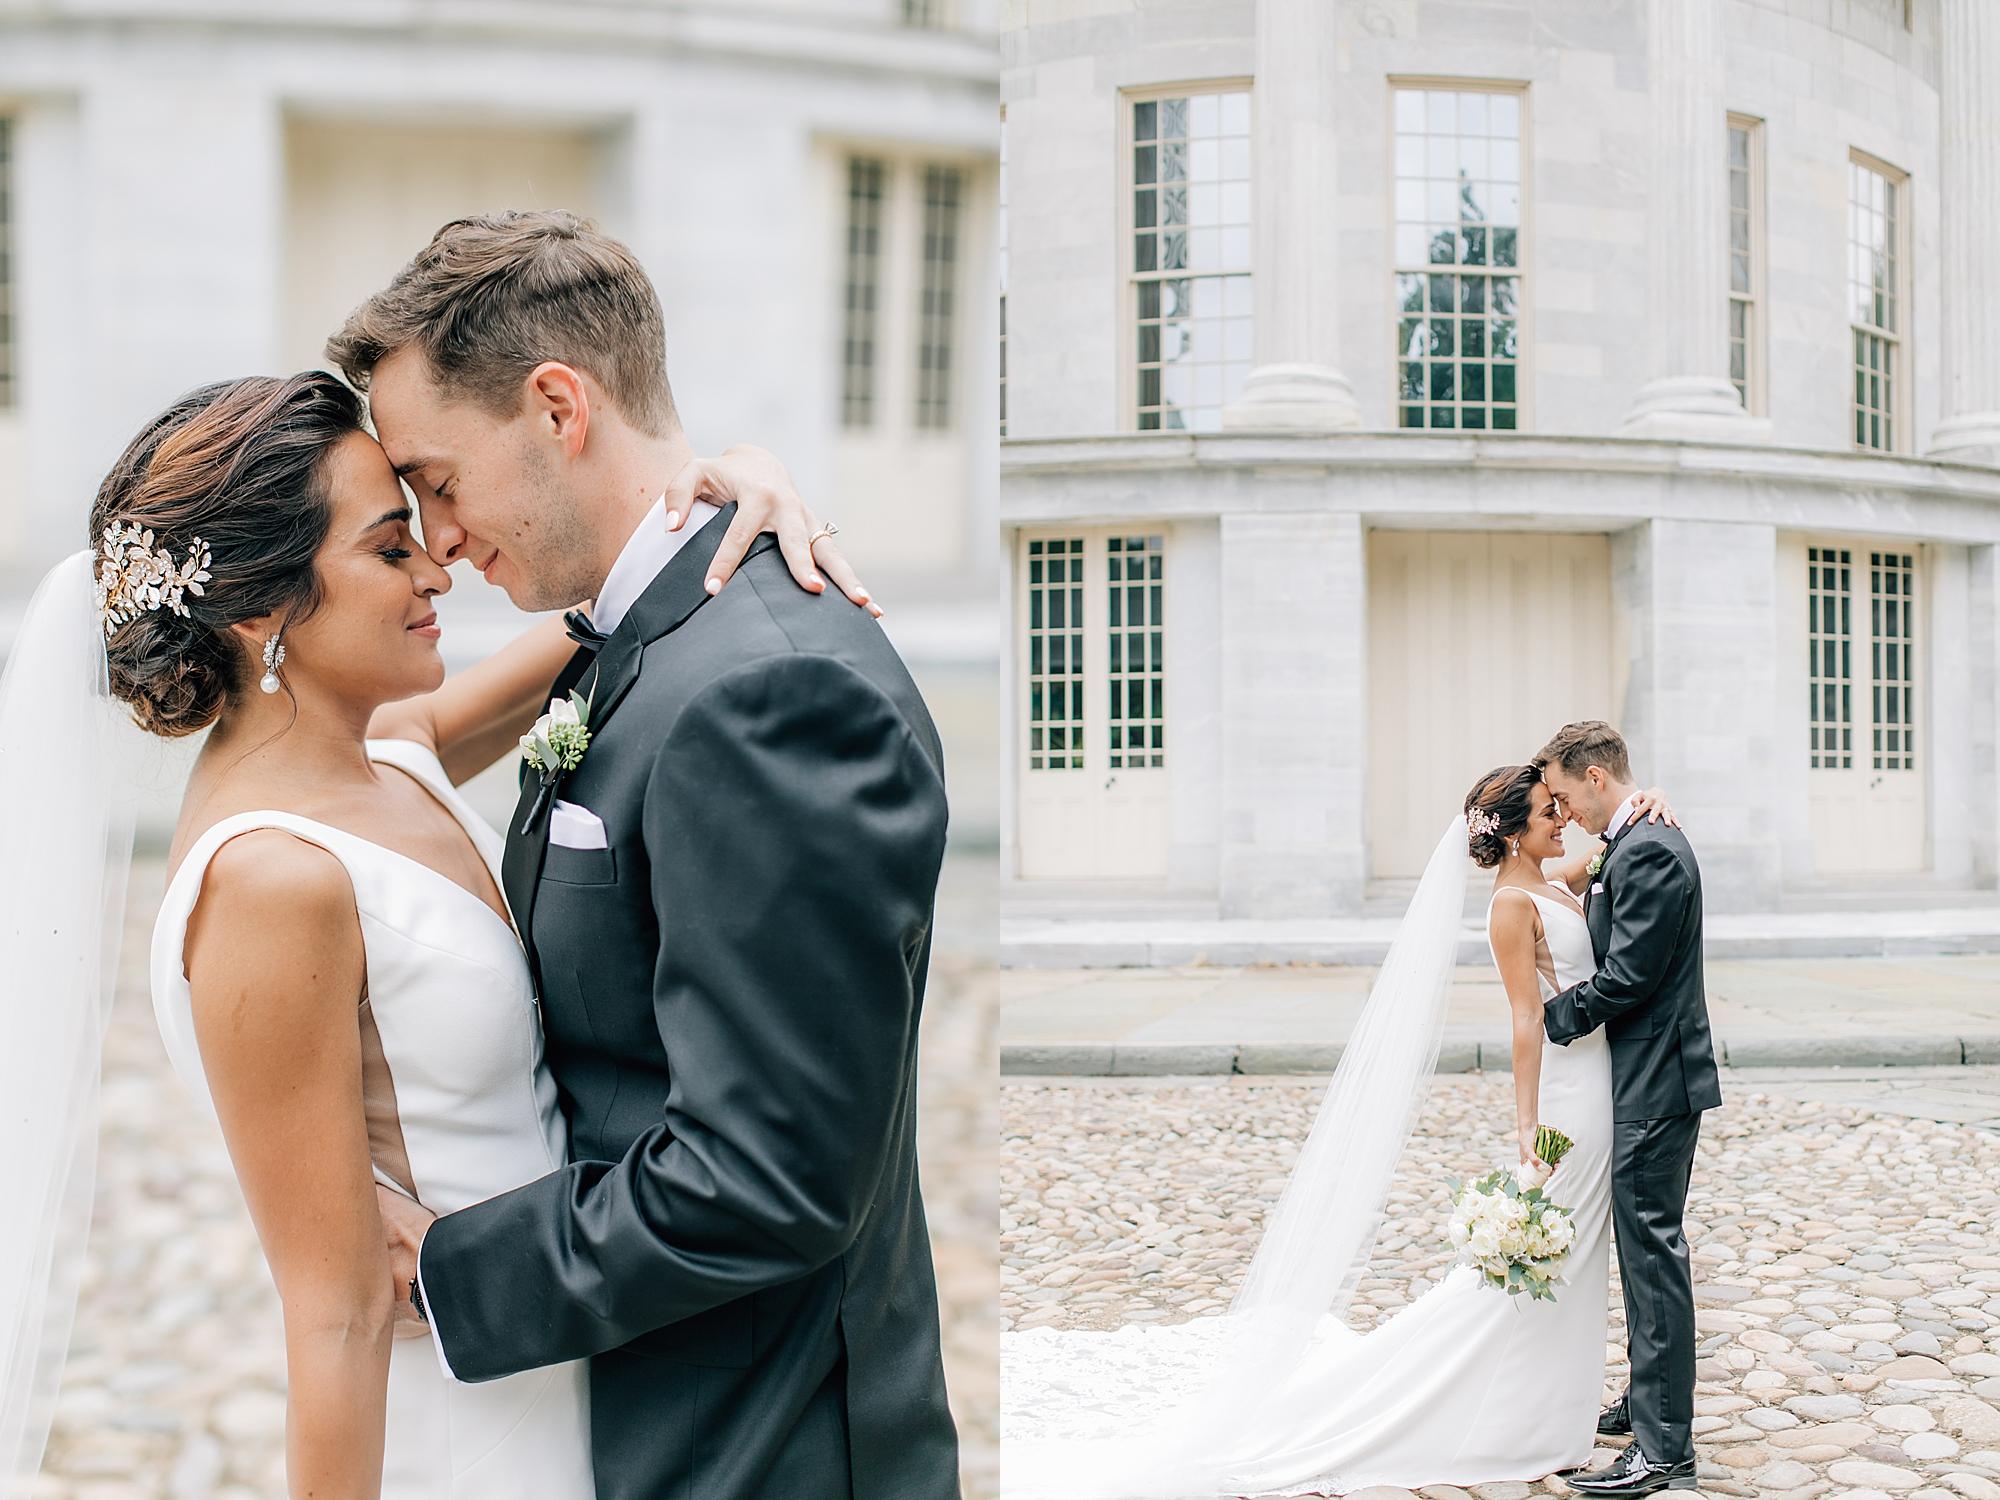 Cescaphe Philadelphia Film Wedding Photography by Magdalena Studios 30